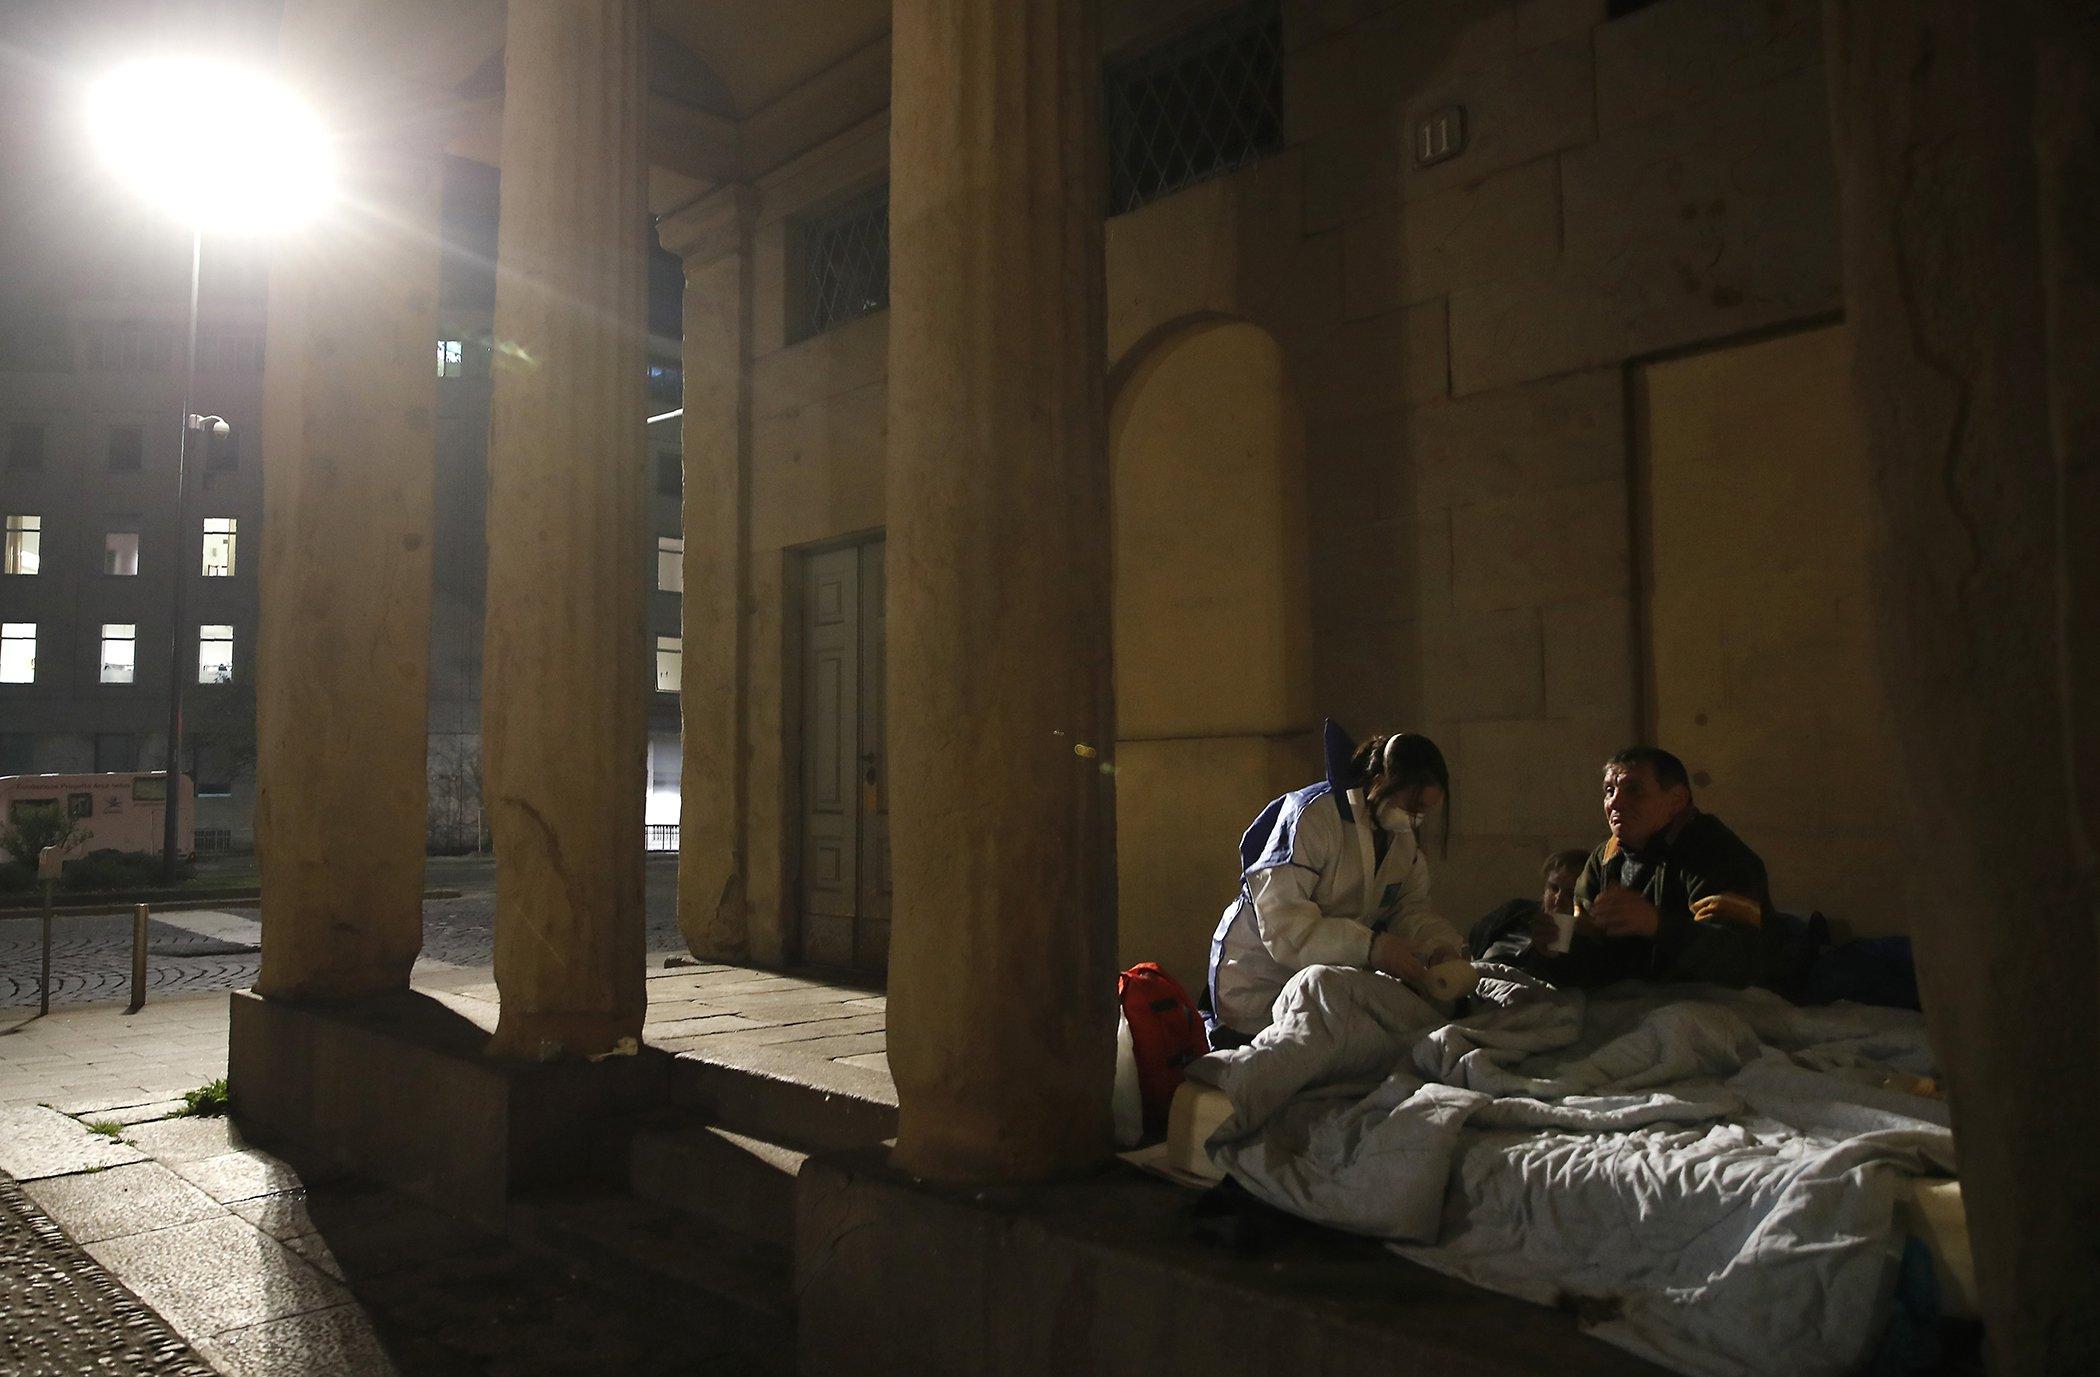 COVID-19-Italy-Emergency-Workers-Homeless.jpg